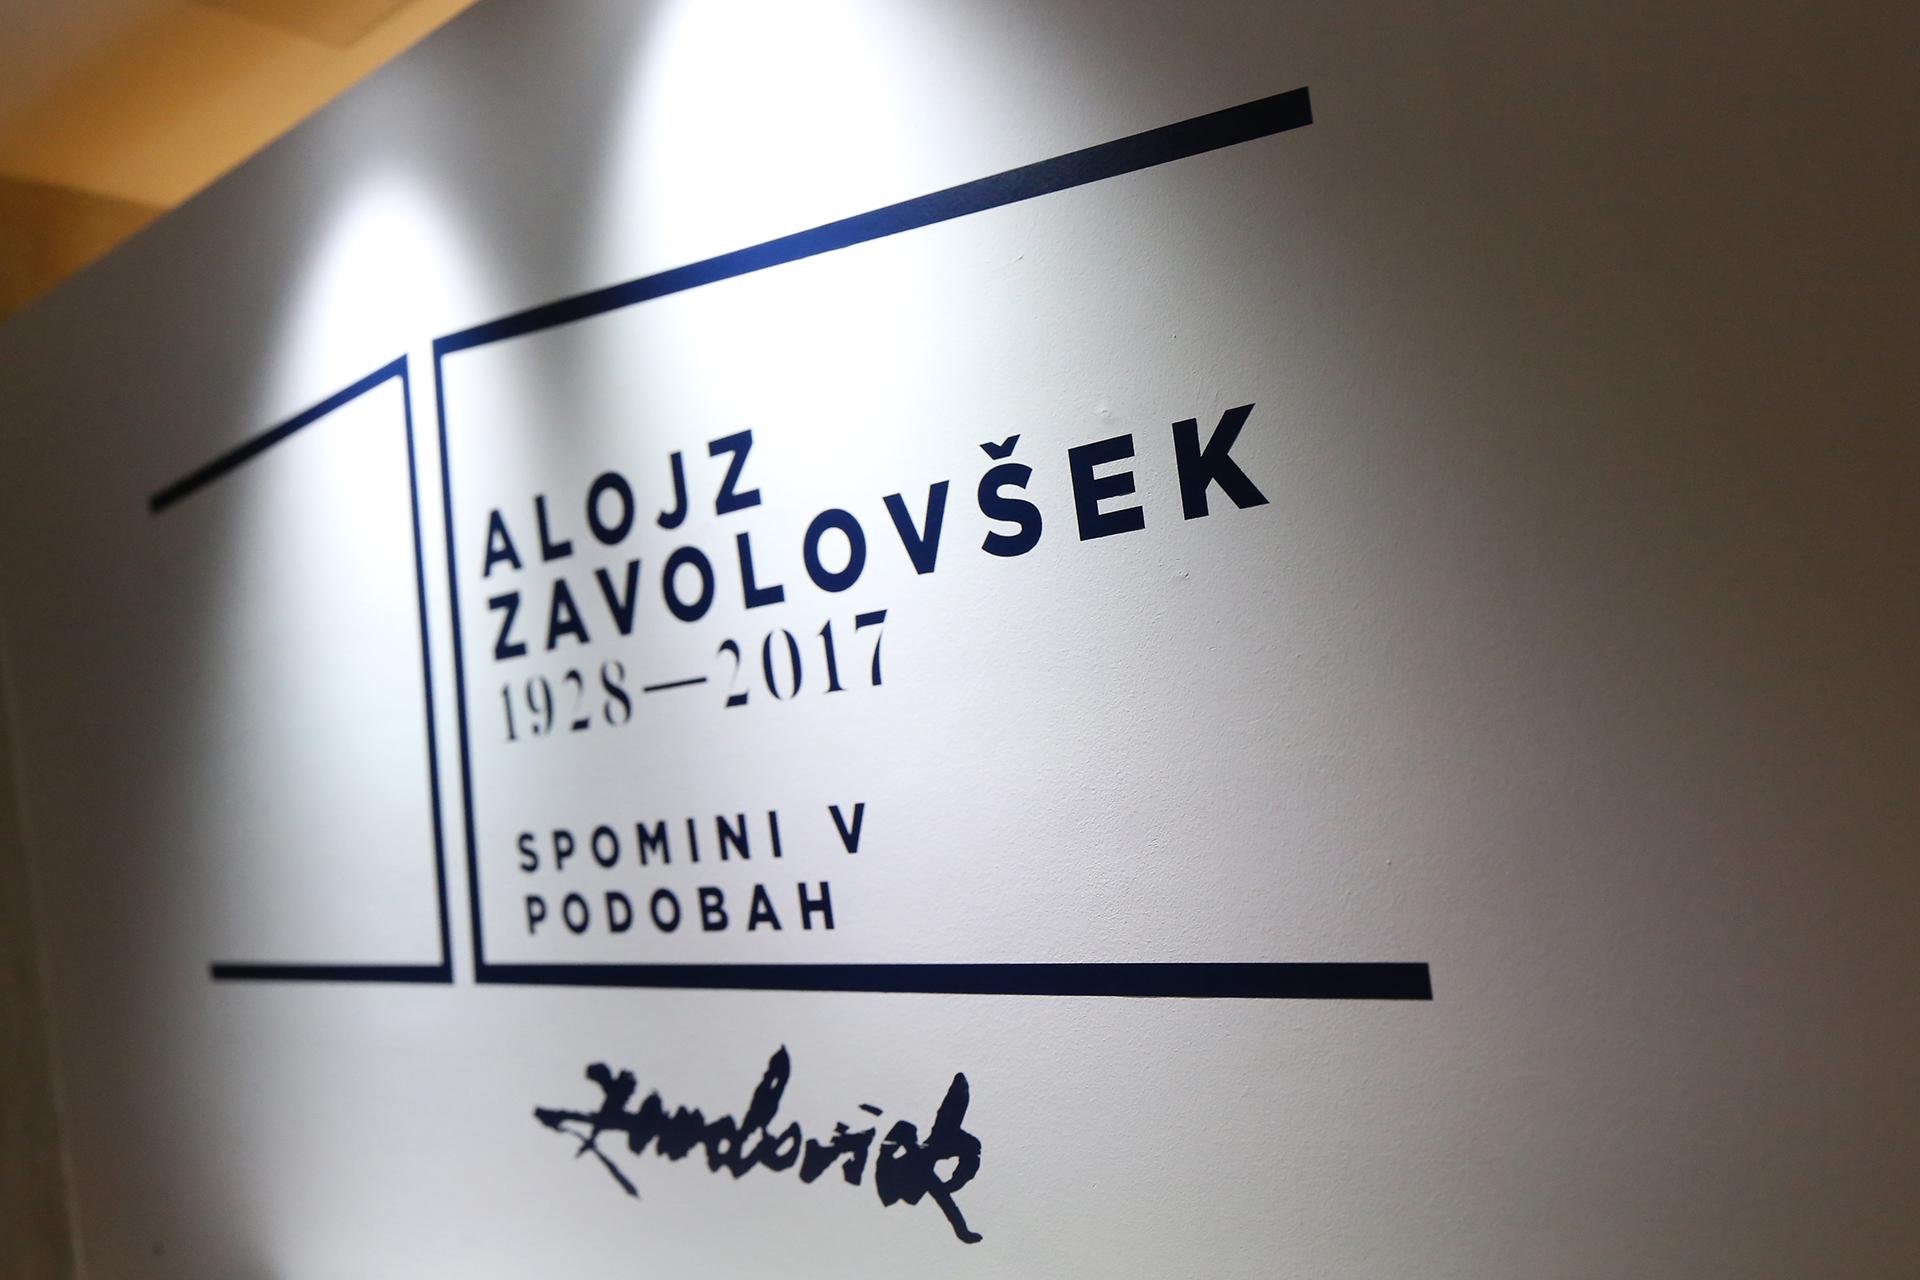 razstava_zavolovsek_galerija_velenje_marko_marinsek_studio_ma-ma_13